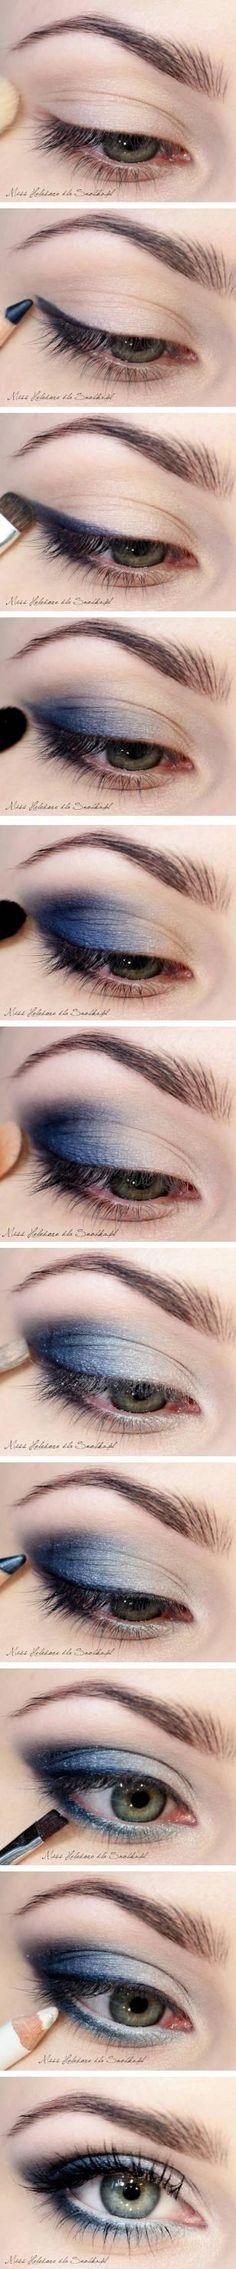 Blue Smokey Eye Tutorial